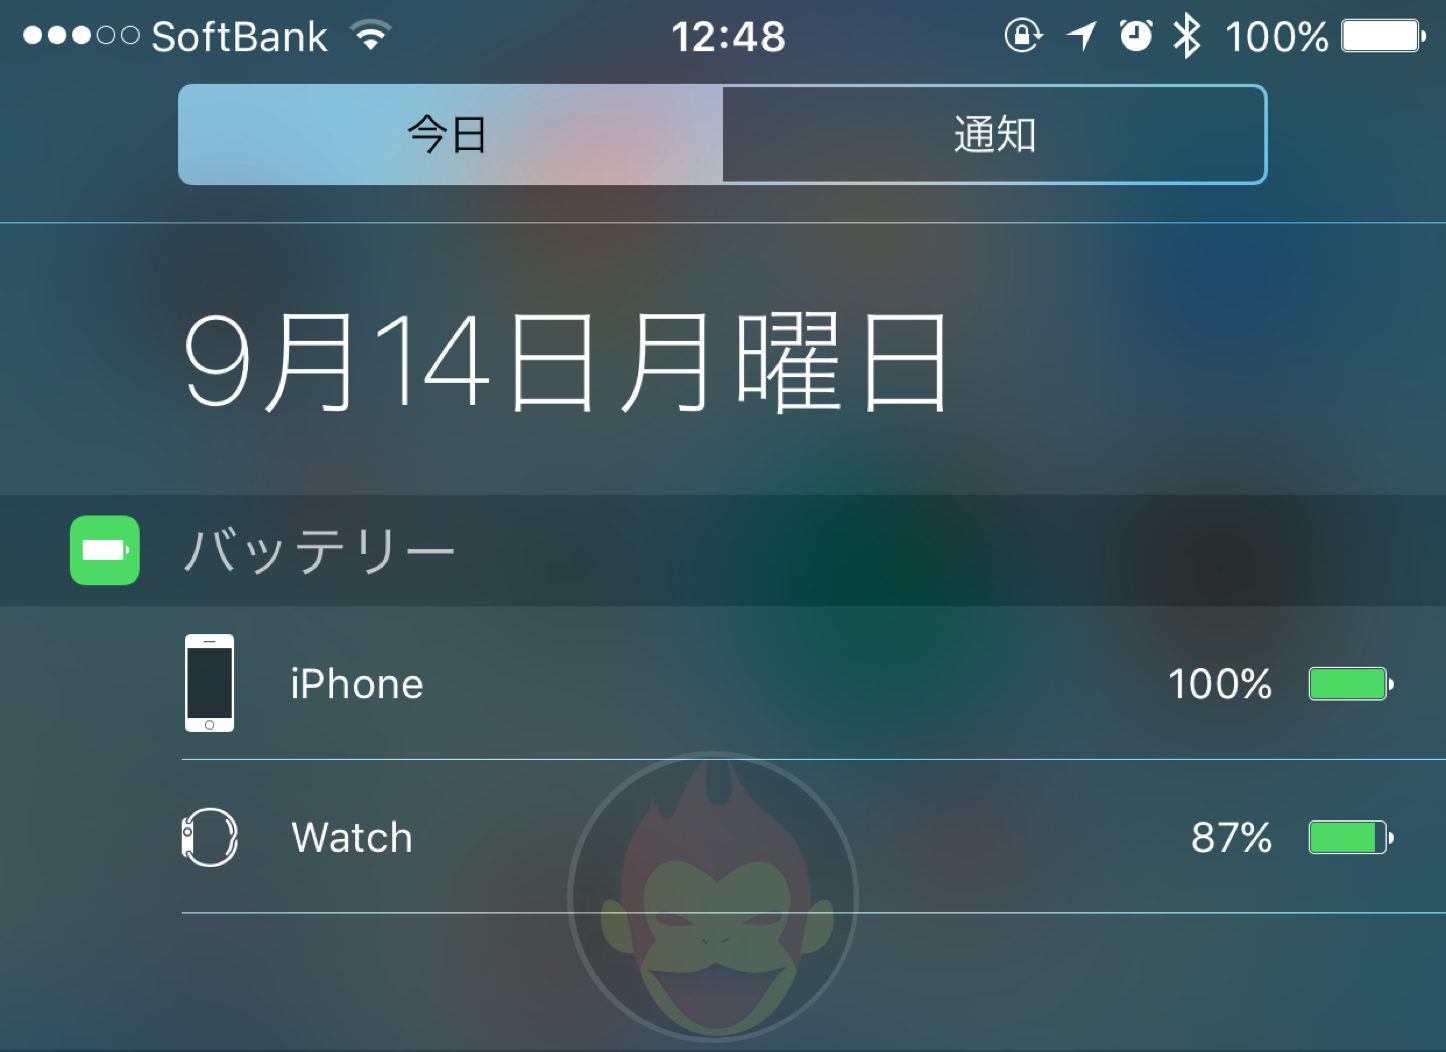 iOS-9-Widgets-01.png